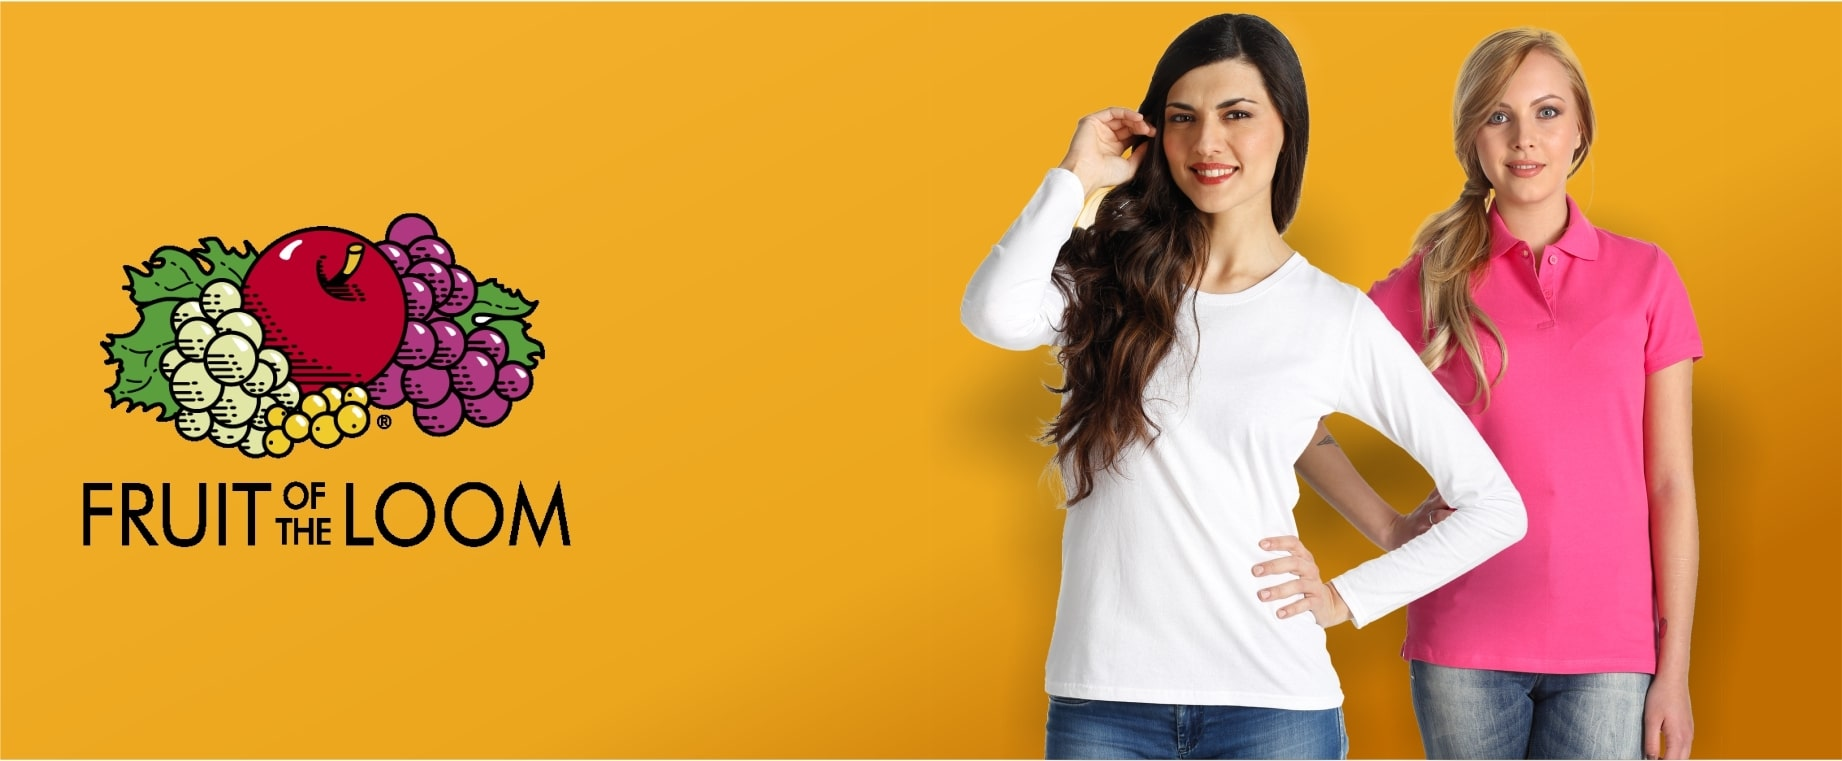 banner-home-t-shirt-bianca-fruit-of-loom-min